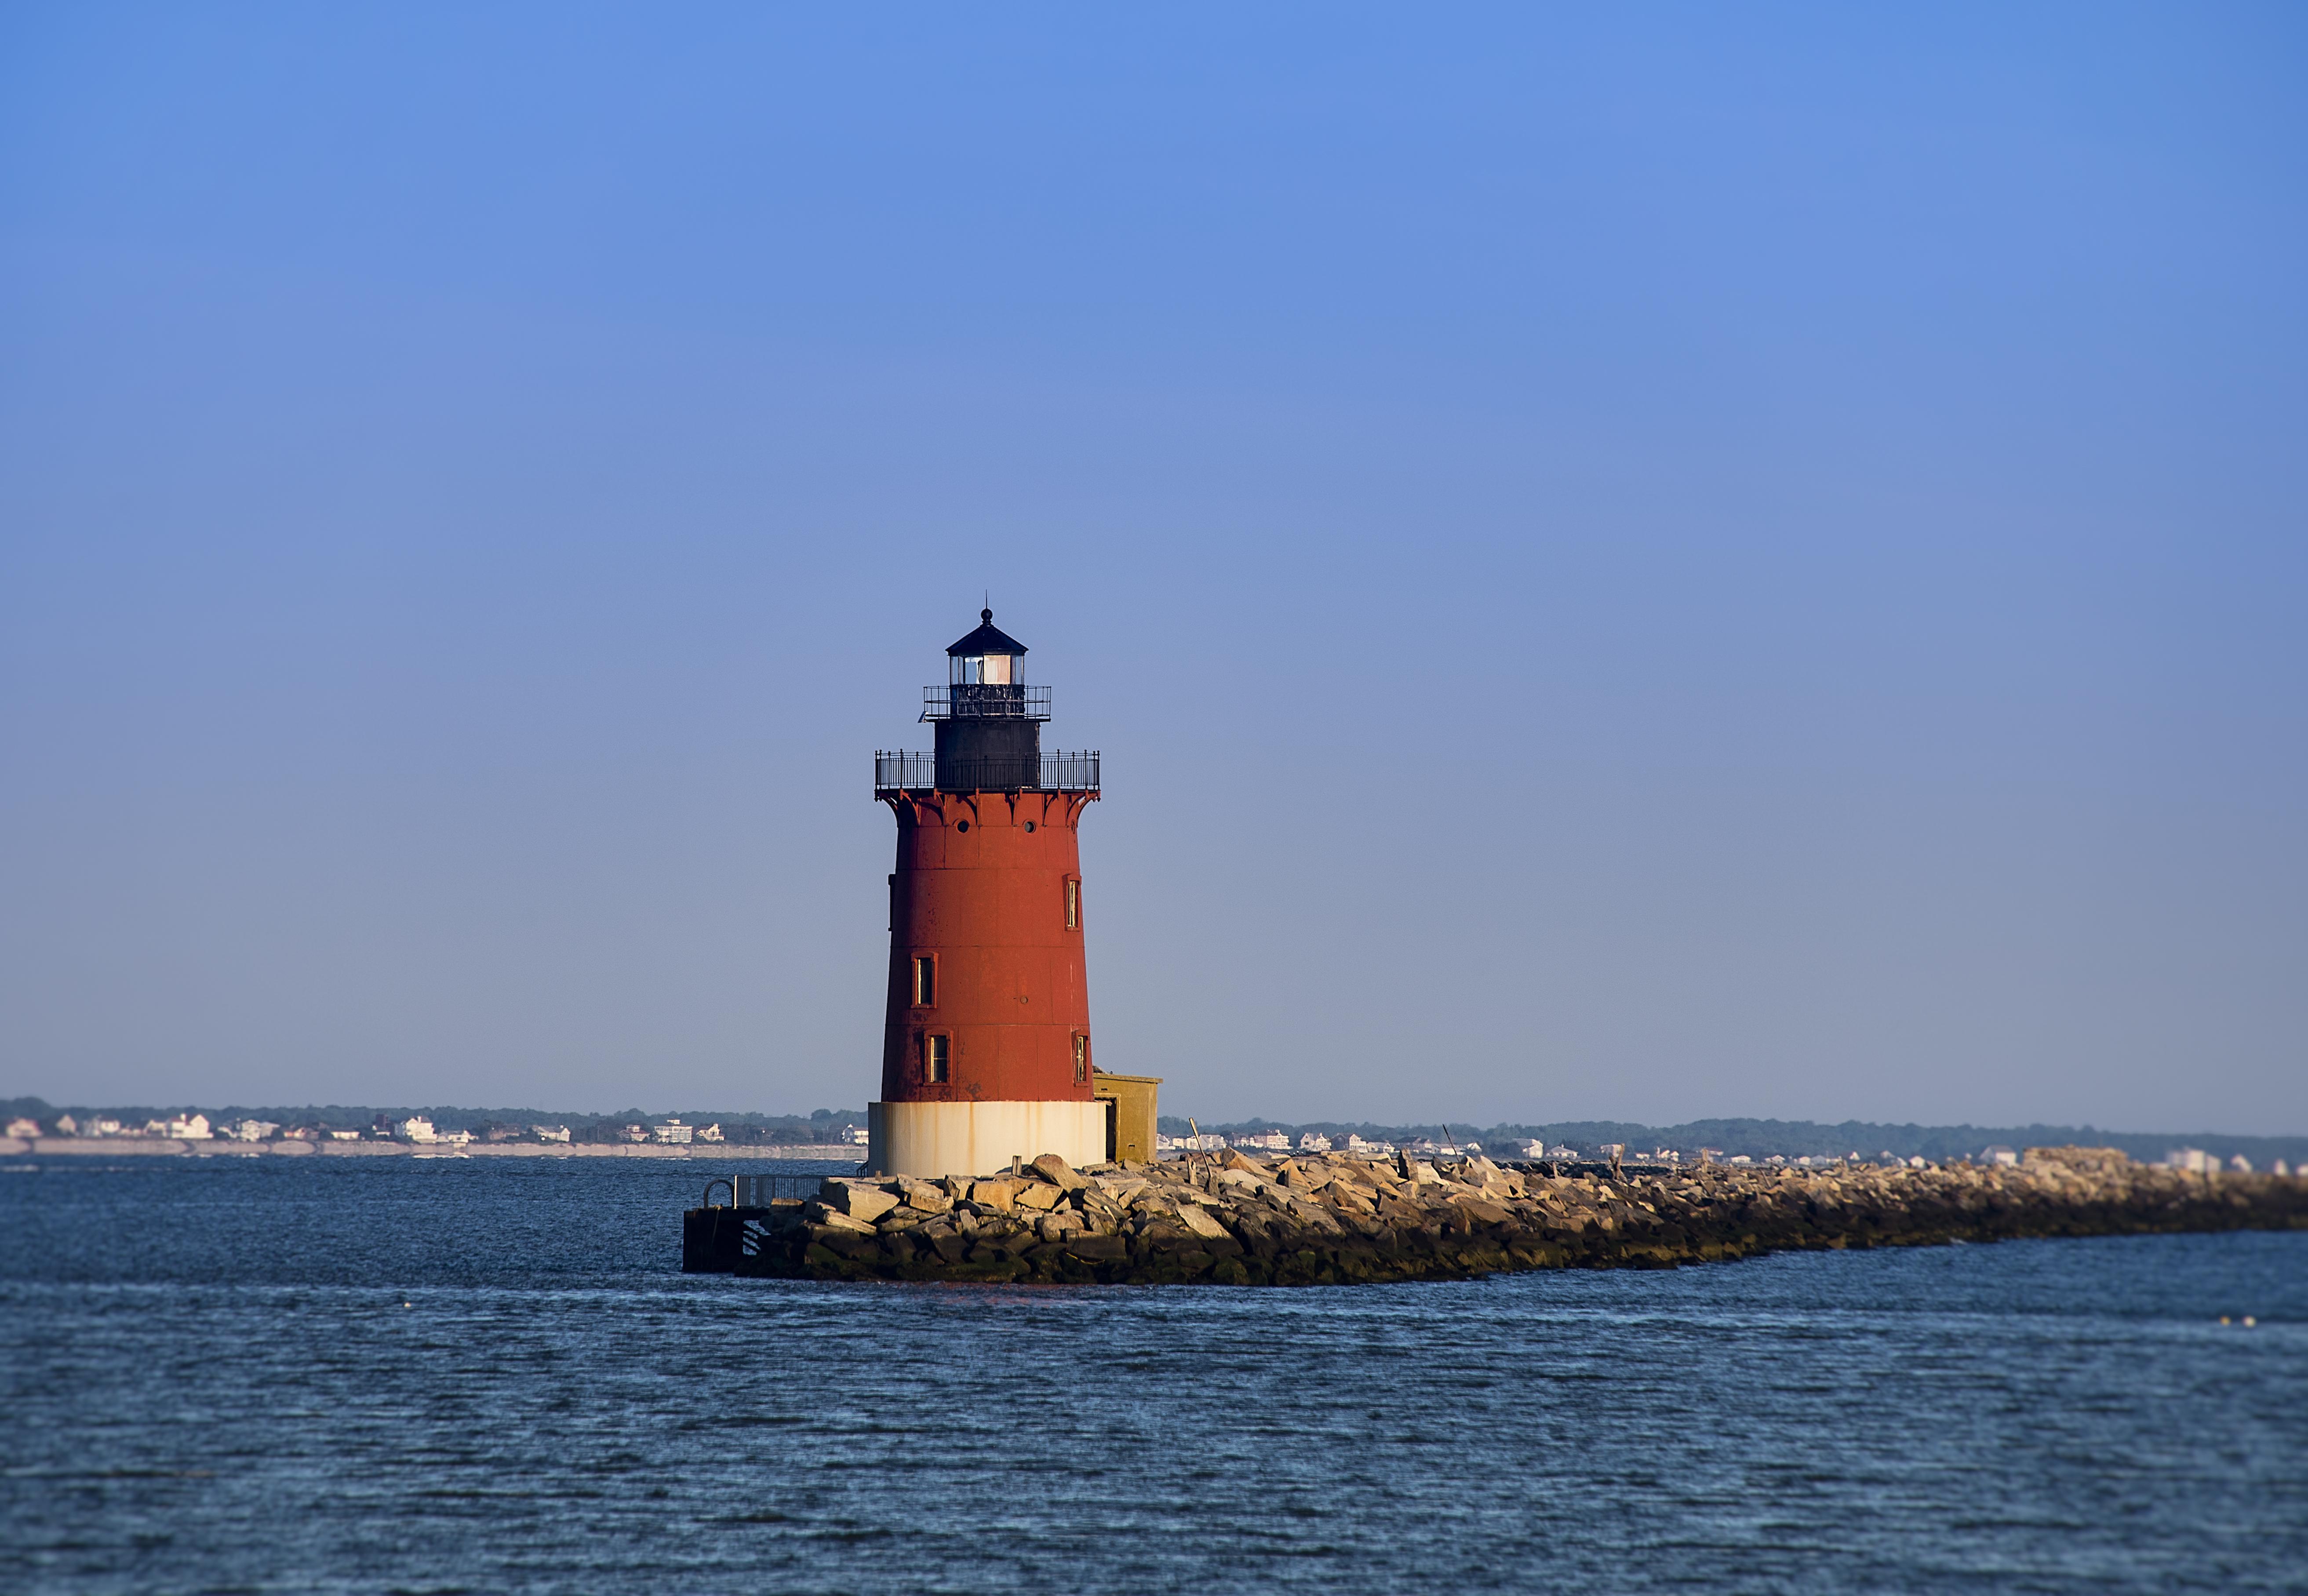 Delaware Breakwater Lighthouse, Lewes, Delaware, U